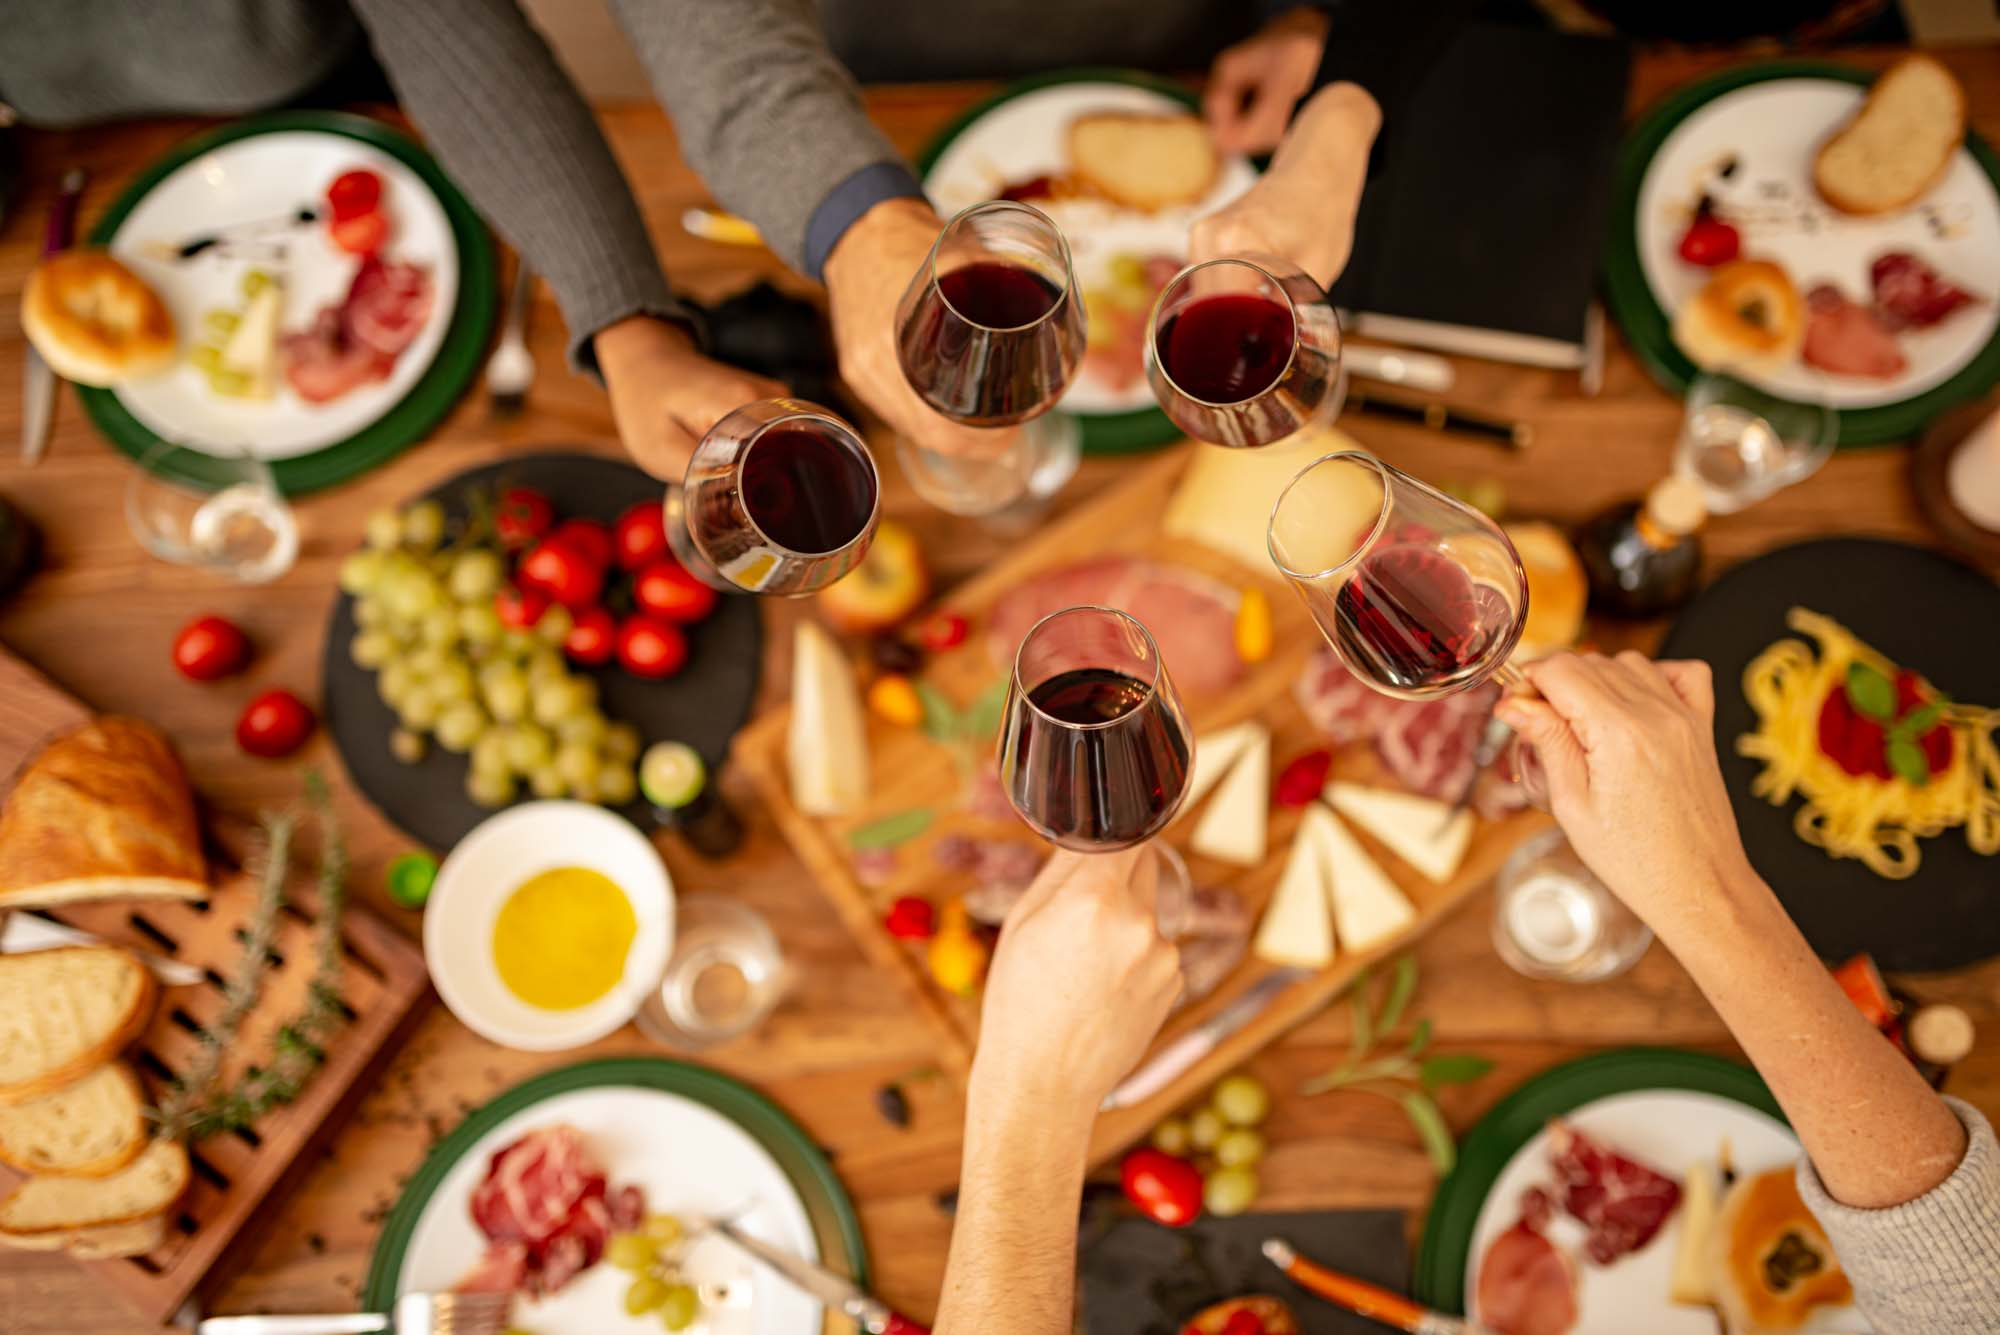 Corsi Di Cucina Eventi Aziendali a Torino